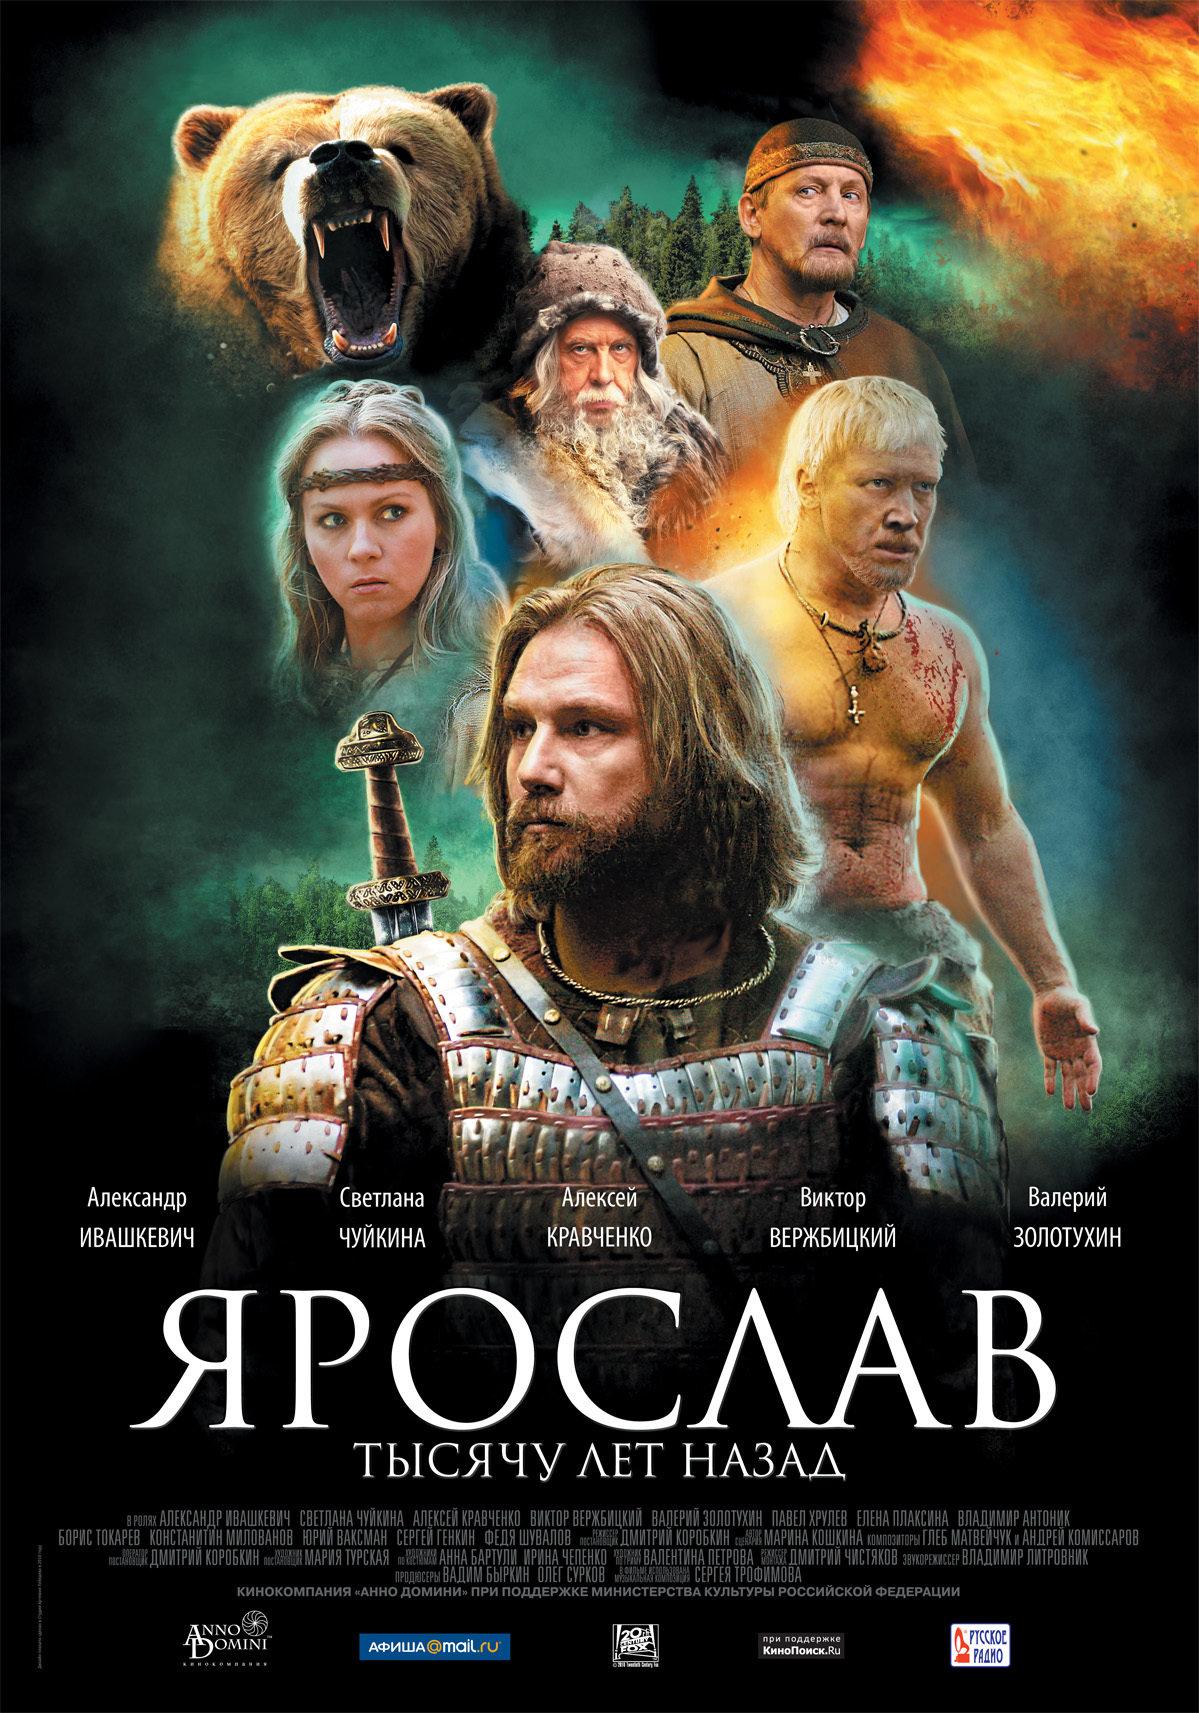 Famous actor Valery Zolotukhin died 03/30/2013 19